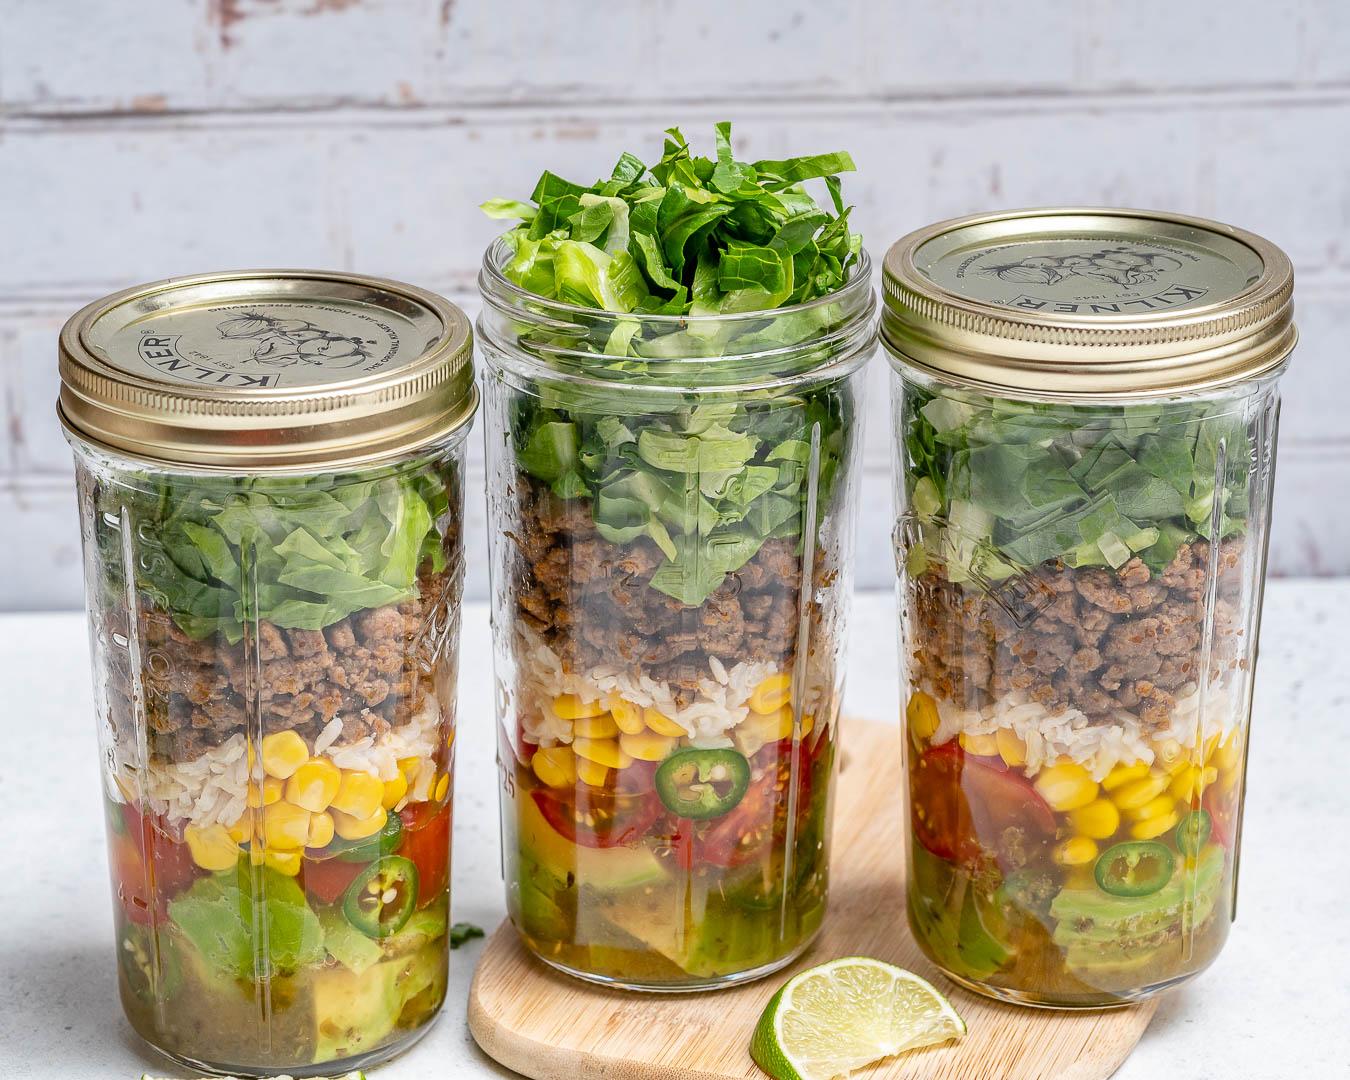 Taco Mason Jar Salads for Meal Prep